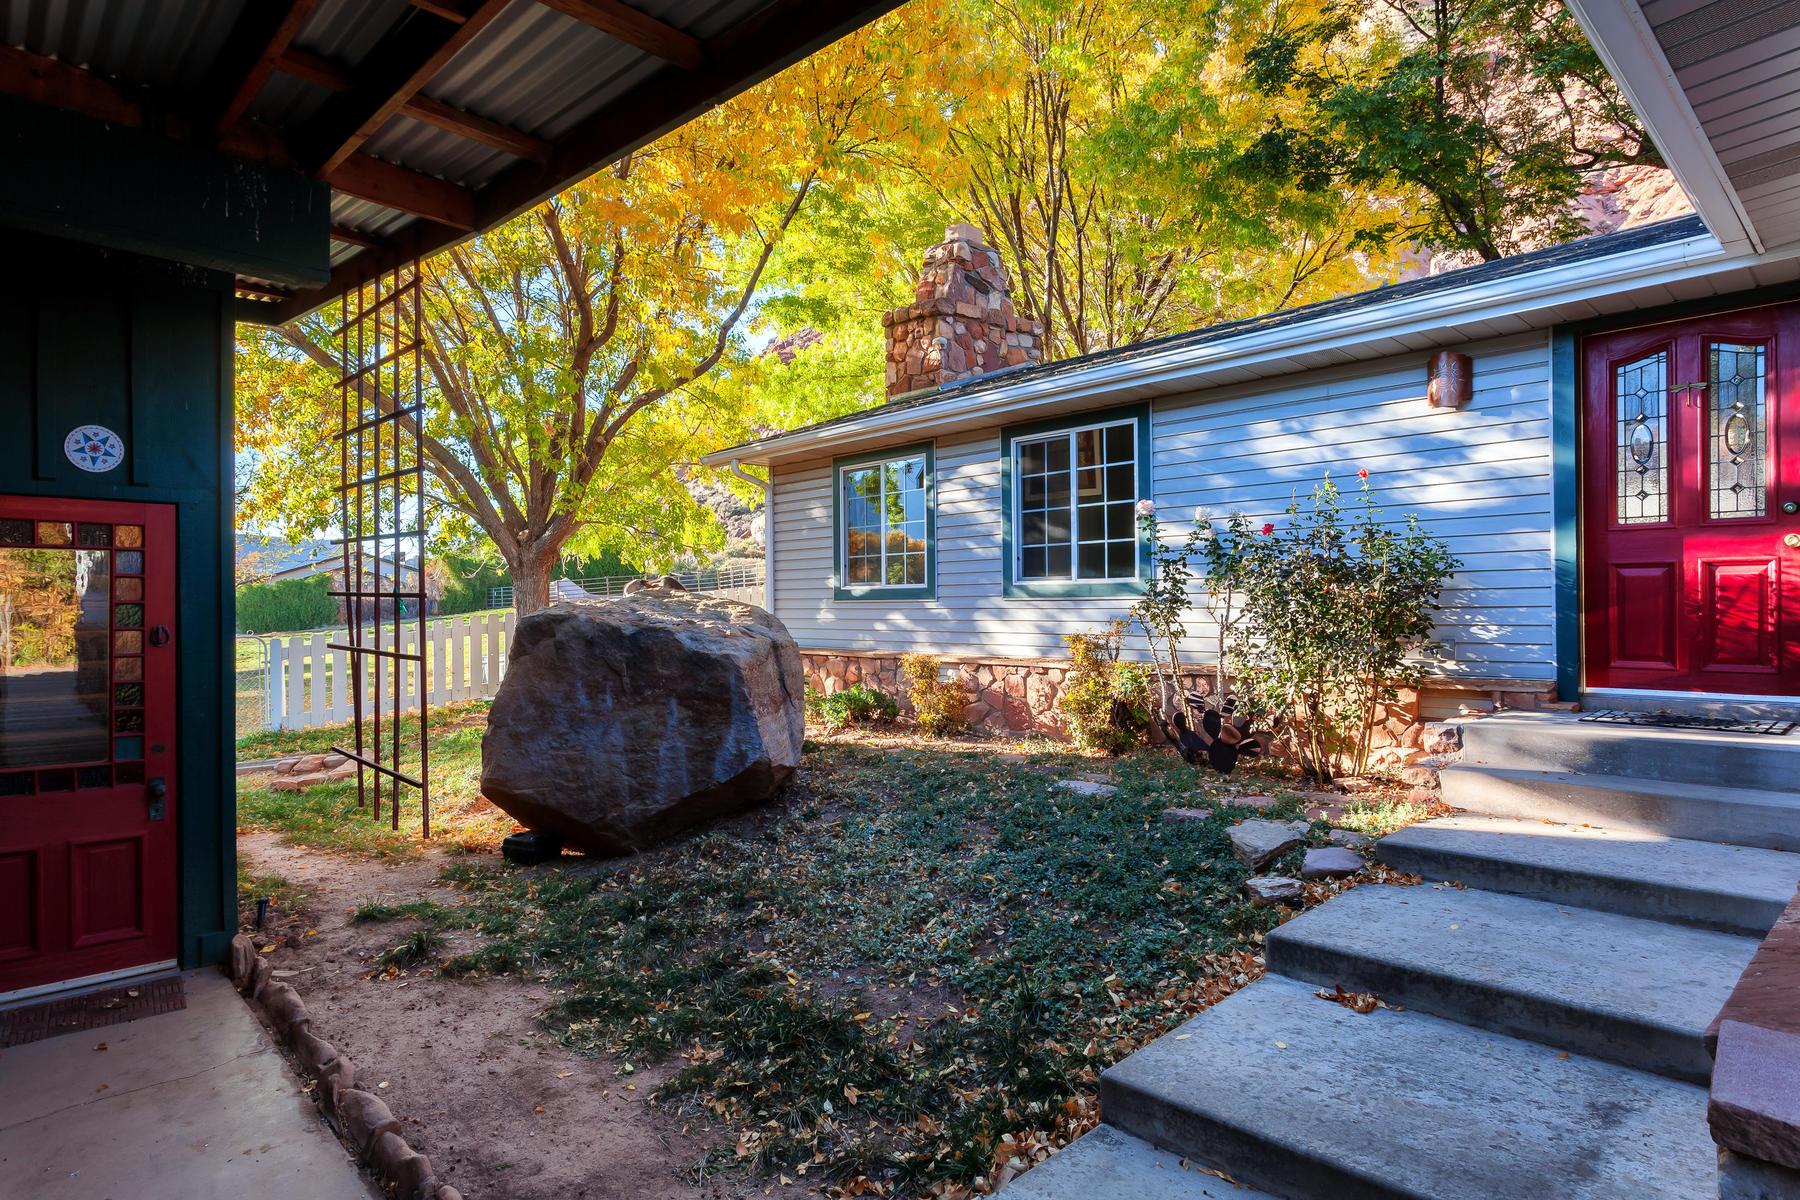 Moradia para Venda às Gentleman's Horse Ranch near Zion 274 W Main St Rockville, Utah, 84763 Estados Unidos